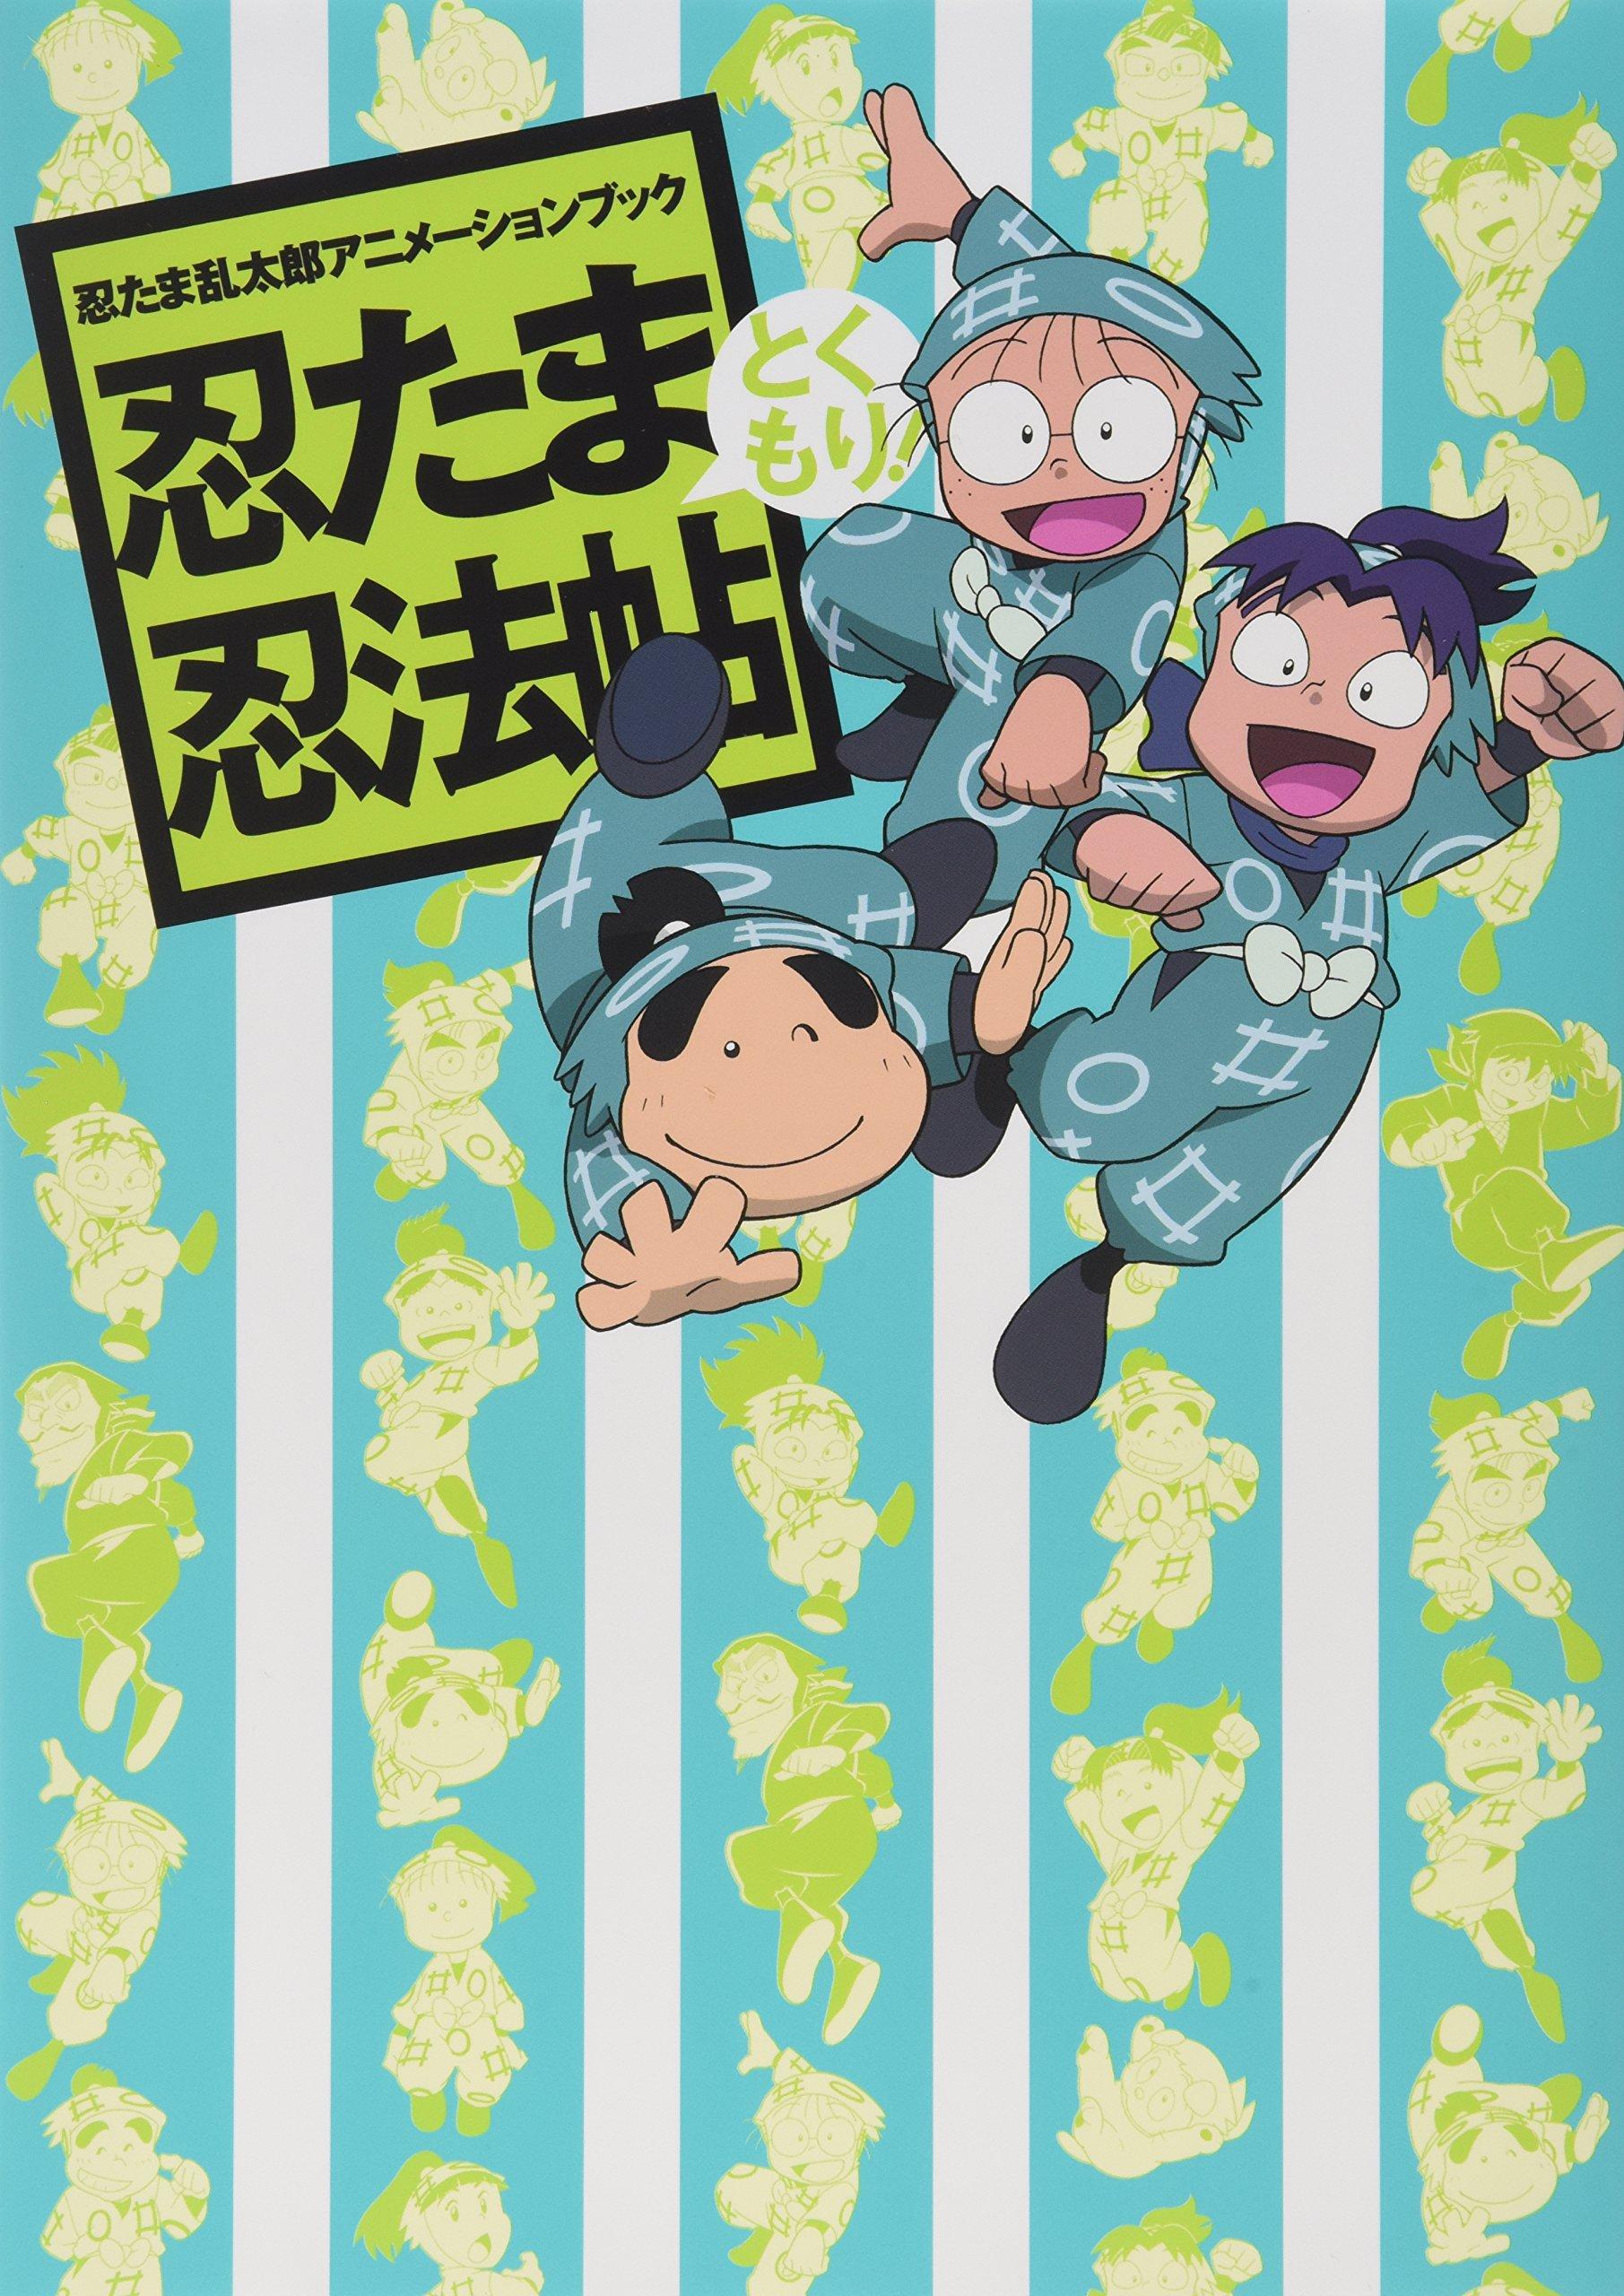 Cloudy shinobi Rantaro animation book Nintama Ninja Art ...